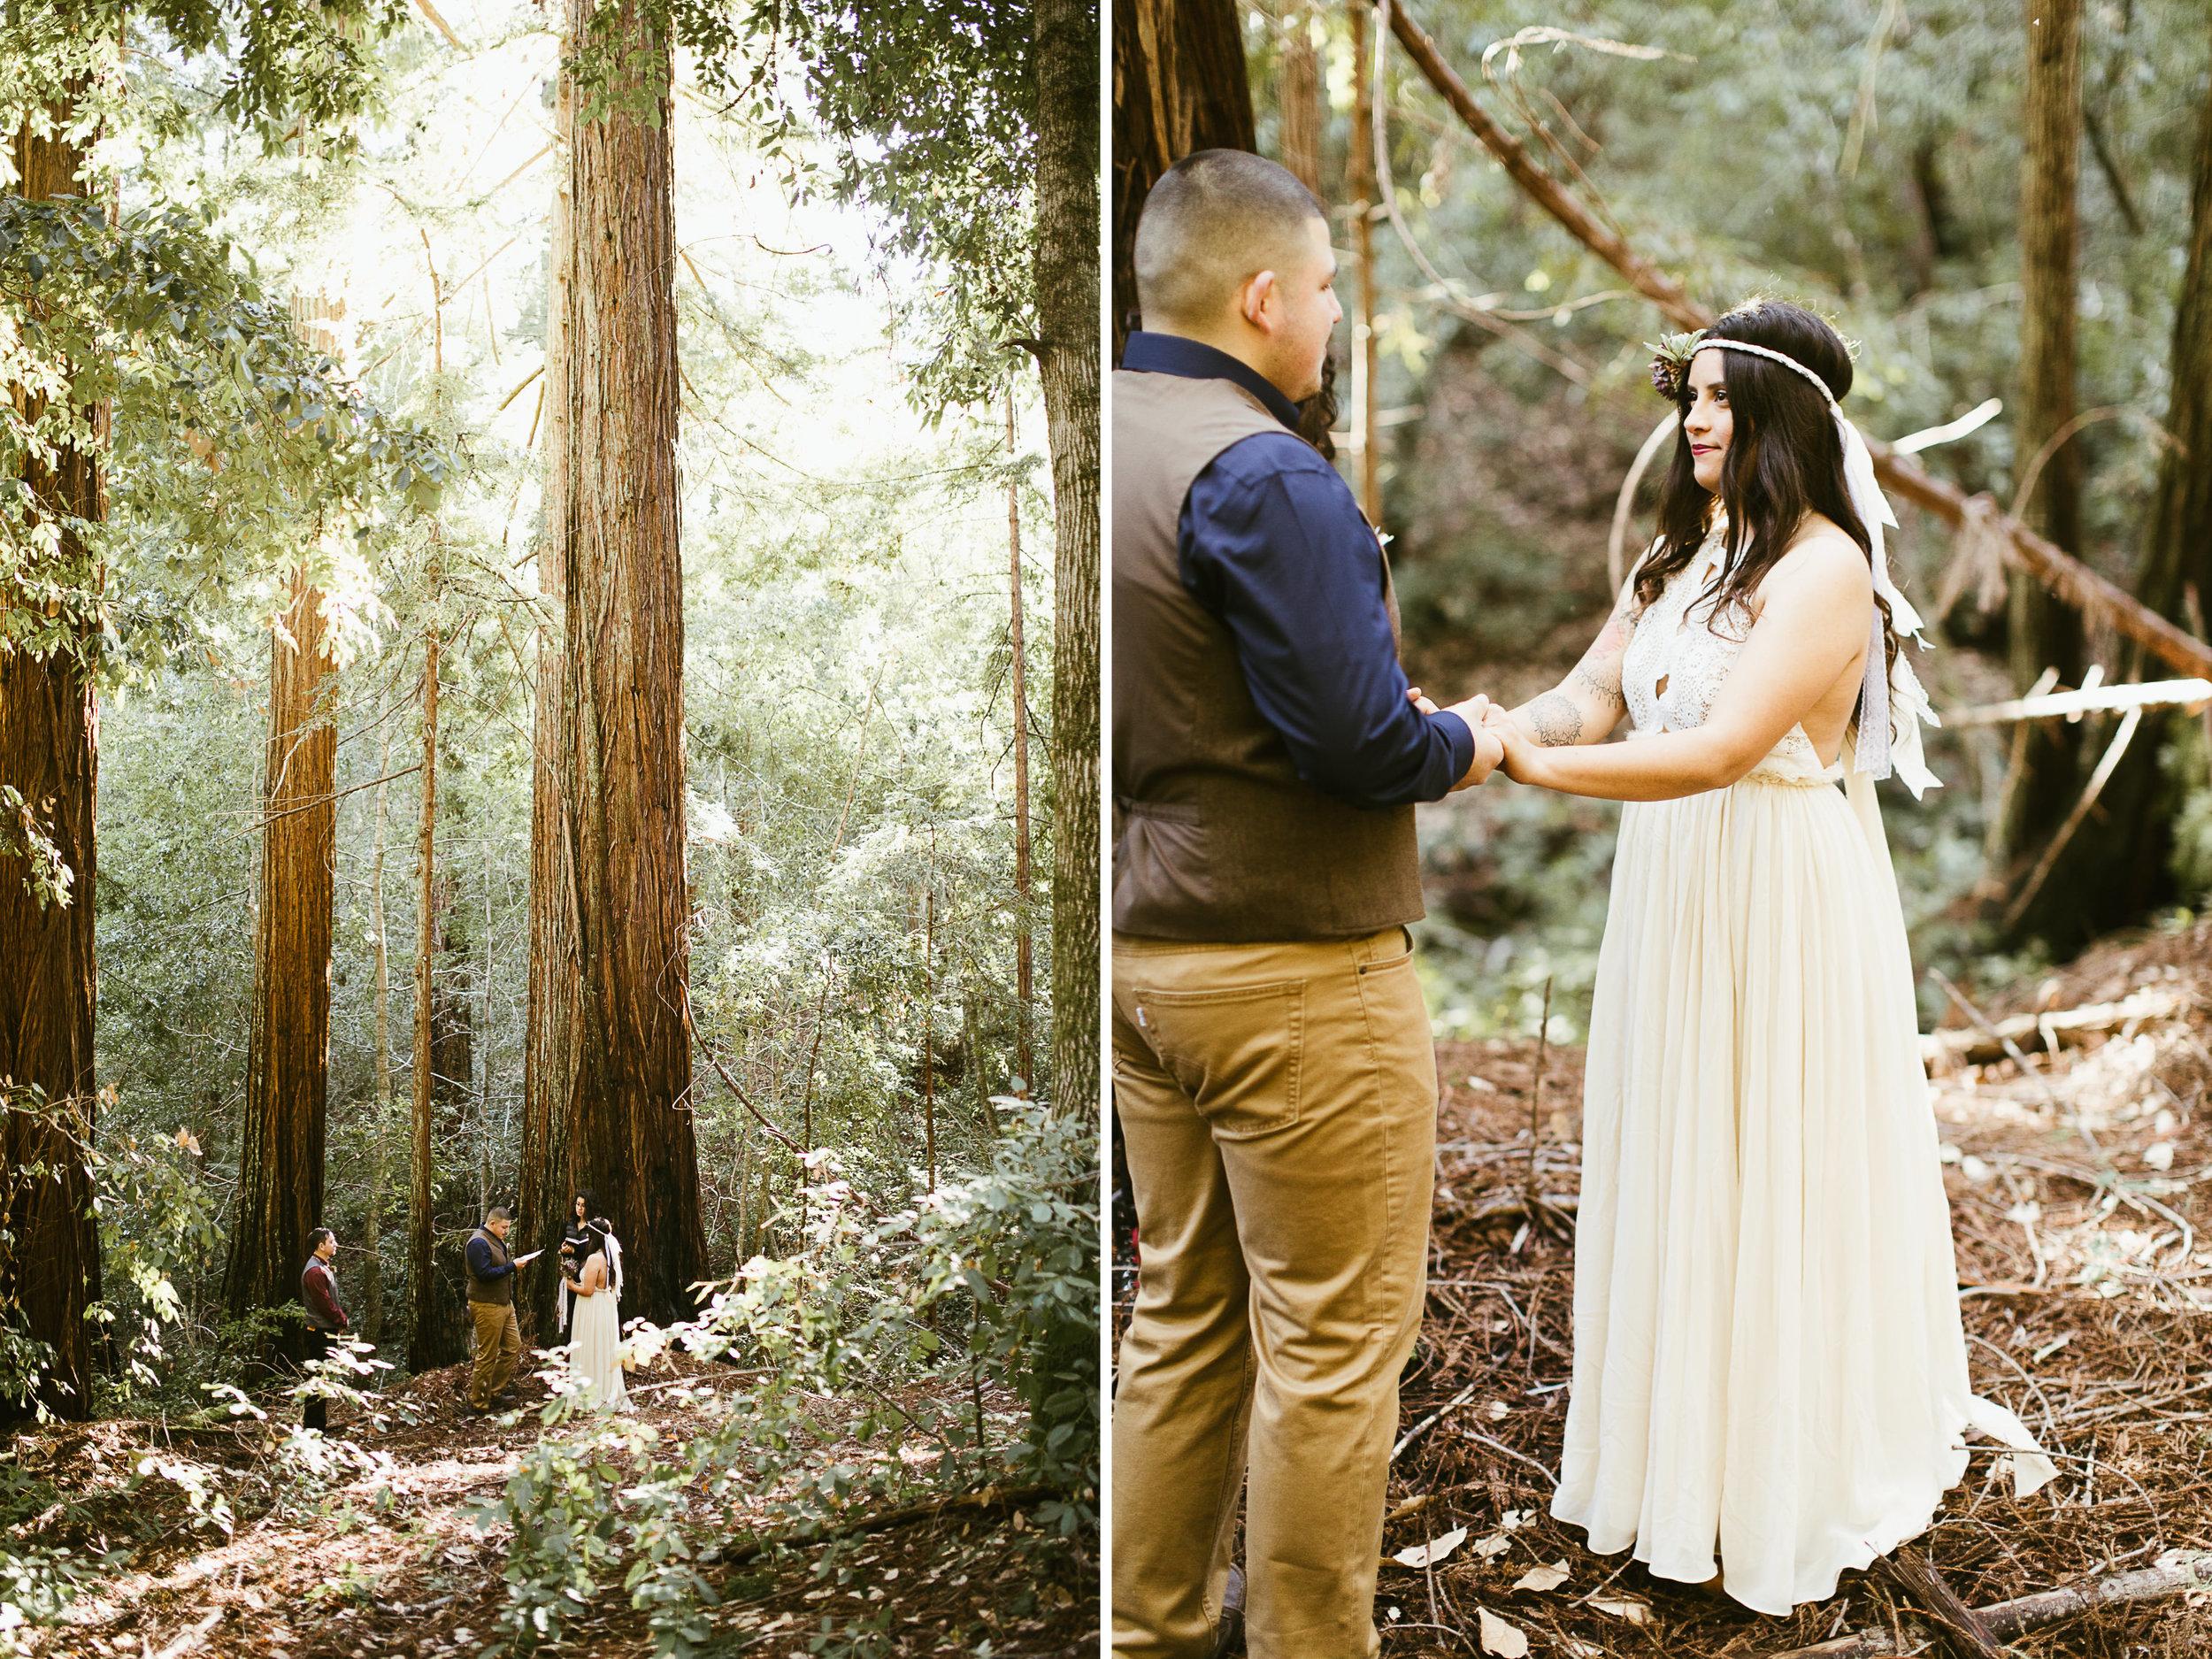 california redwoods forest elopement | destination adventure wedding photographers | the hearnes adventure photography | www.thehearnes.com